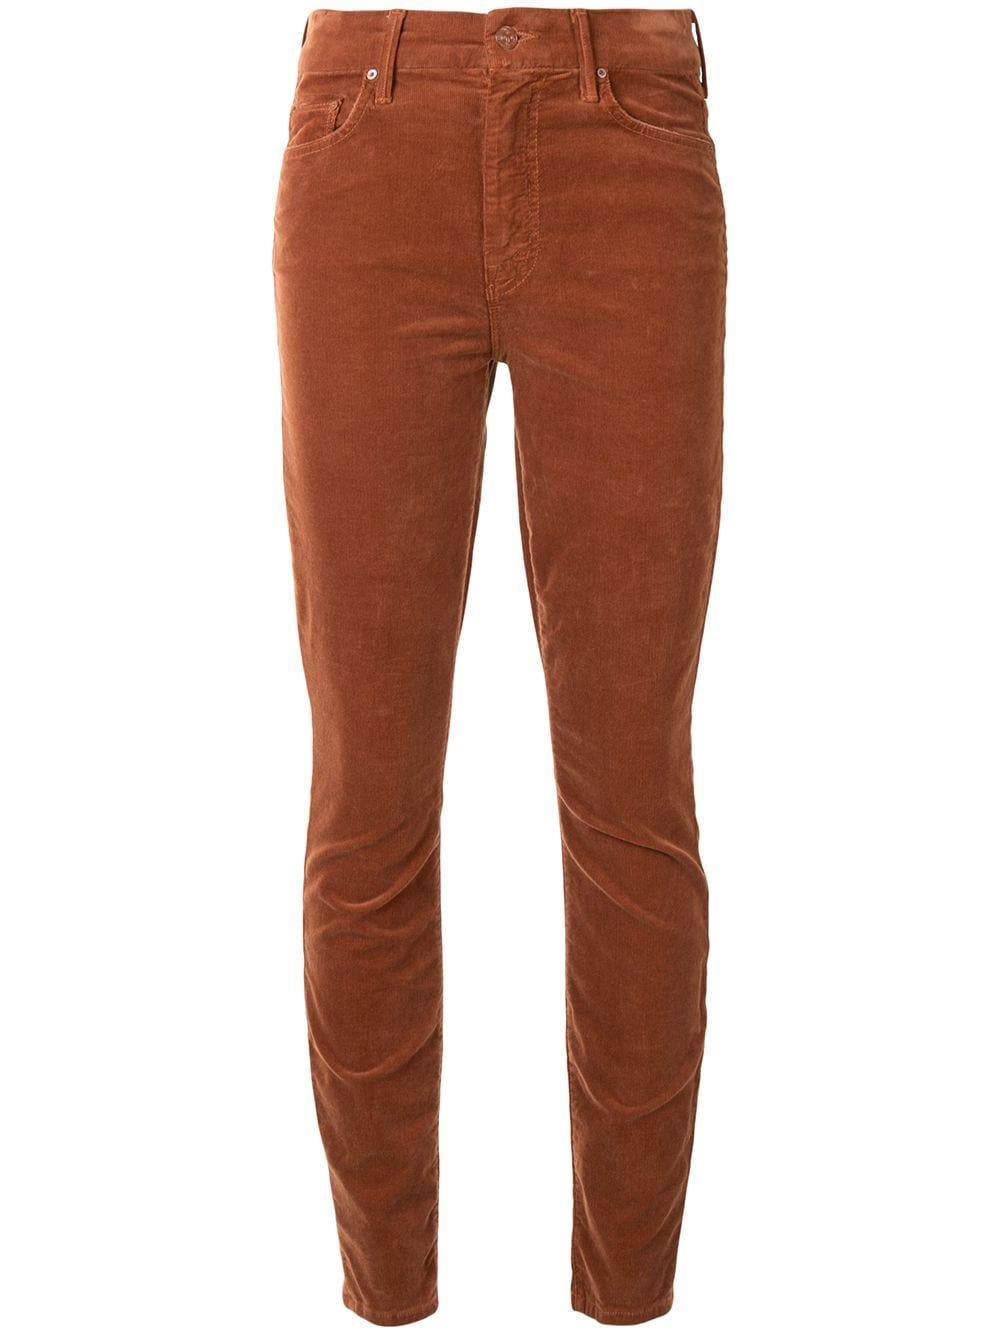 High Waist Looker Corduroy Skinny Pant